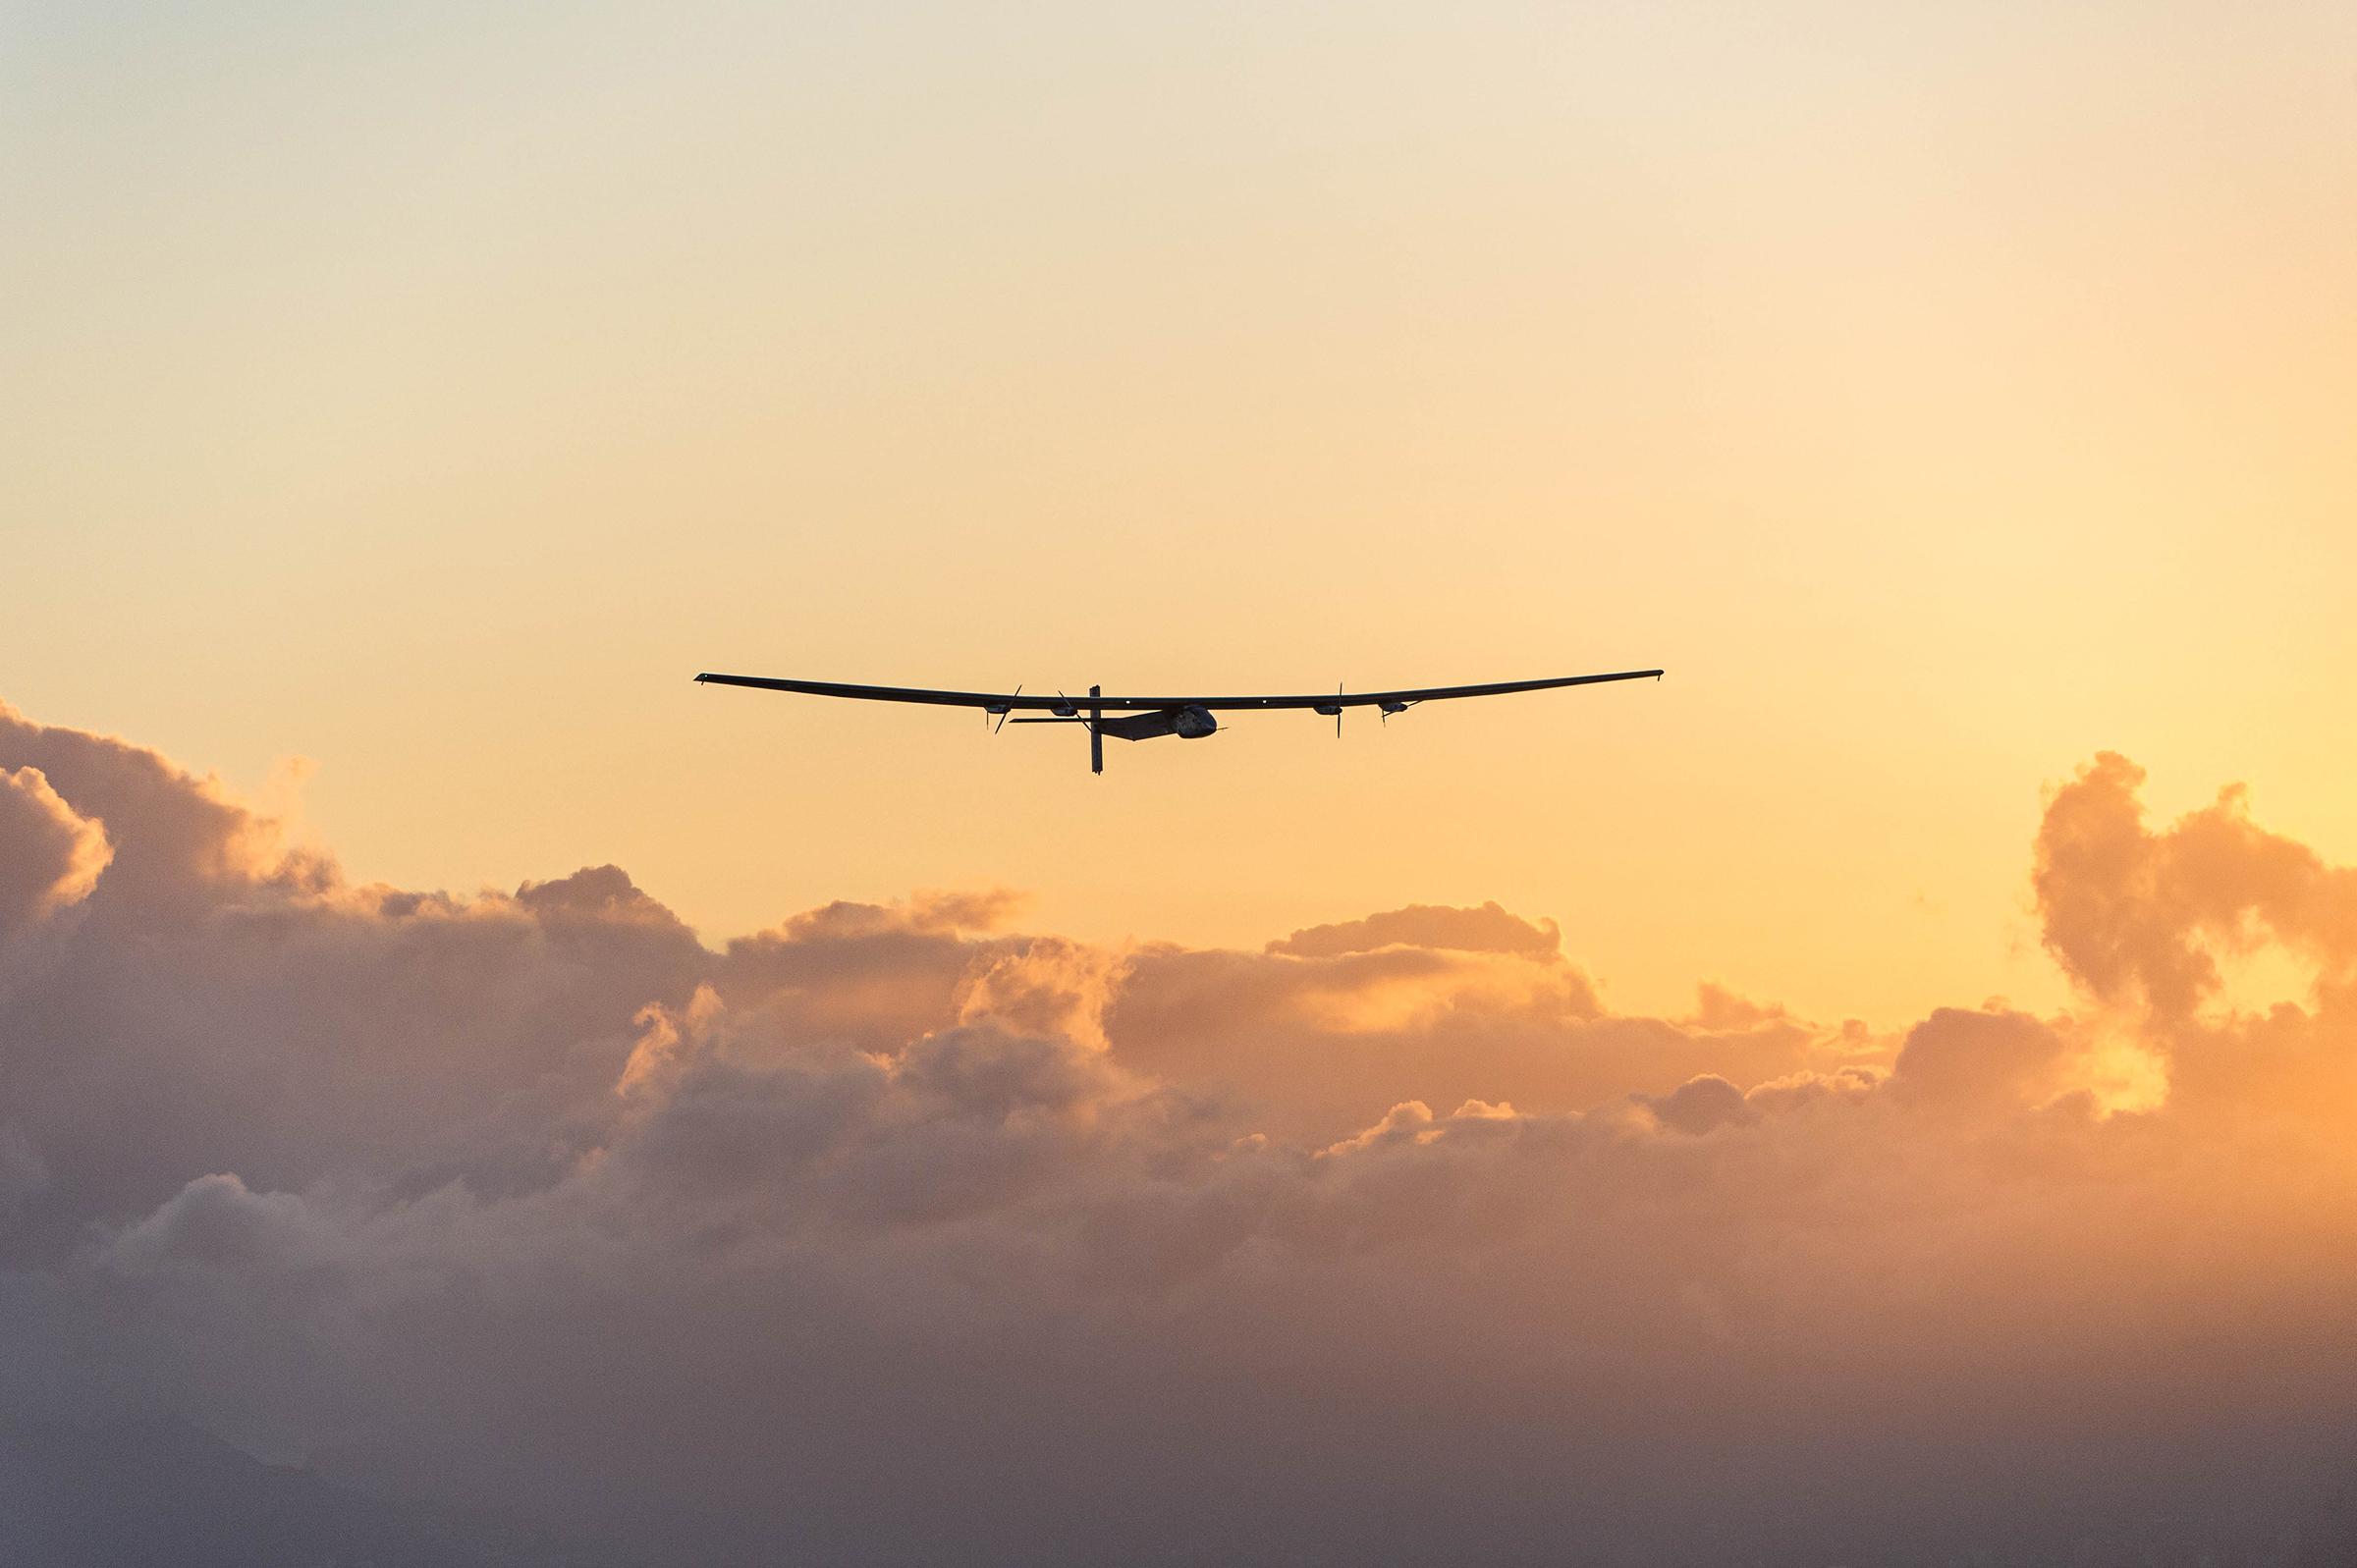 SOLAR IMPULSE 2 IS READY TO FINISH ITS ROUND-THE-WORLD FLIGHT